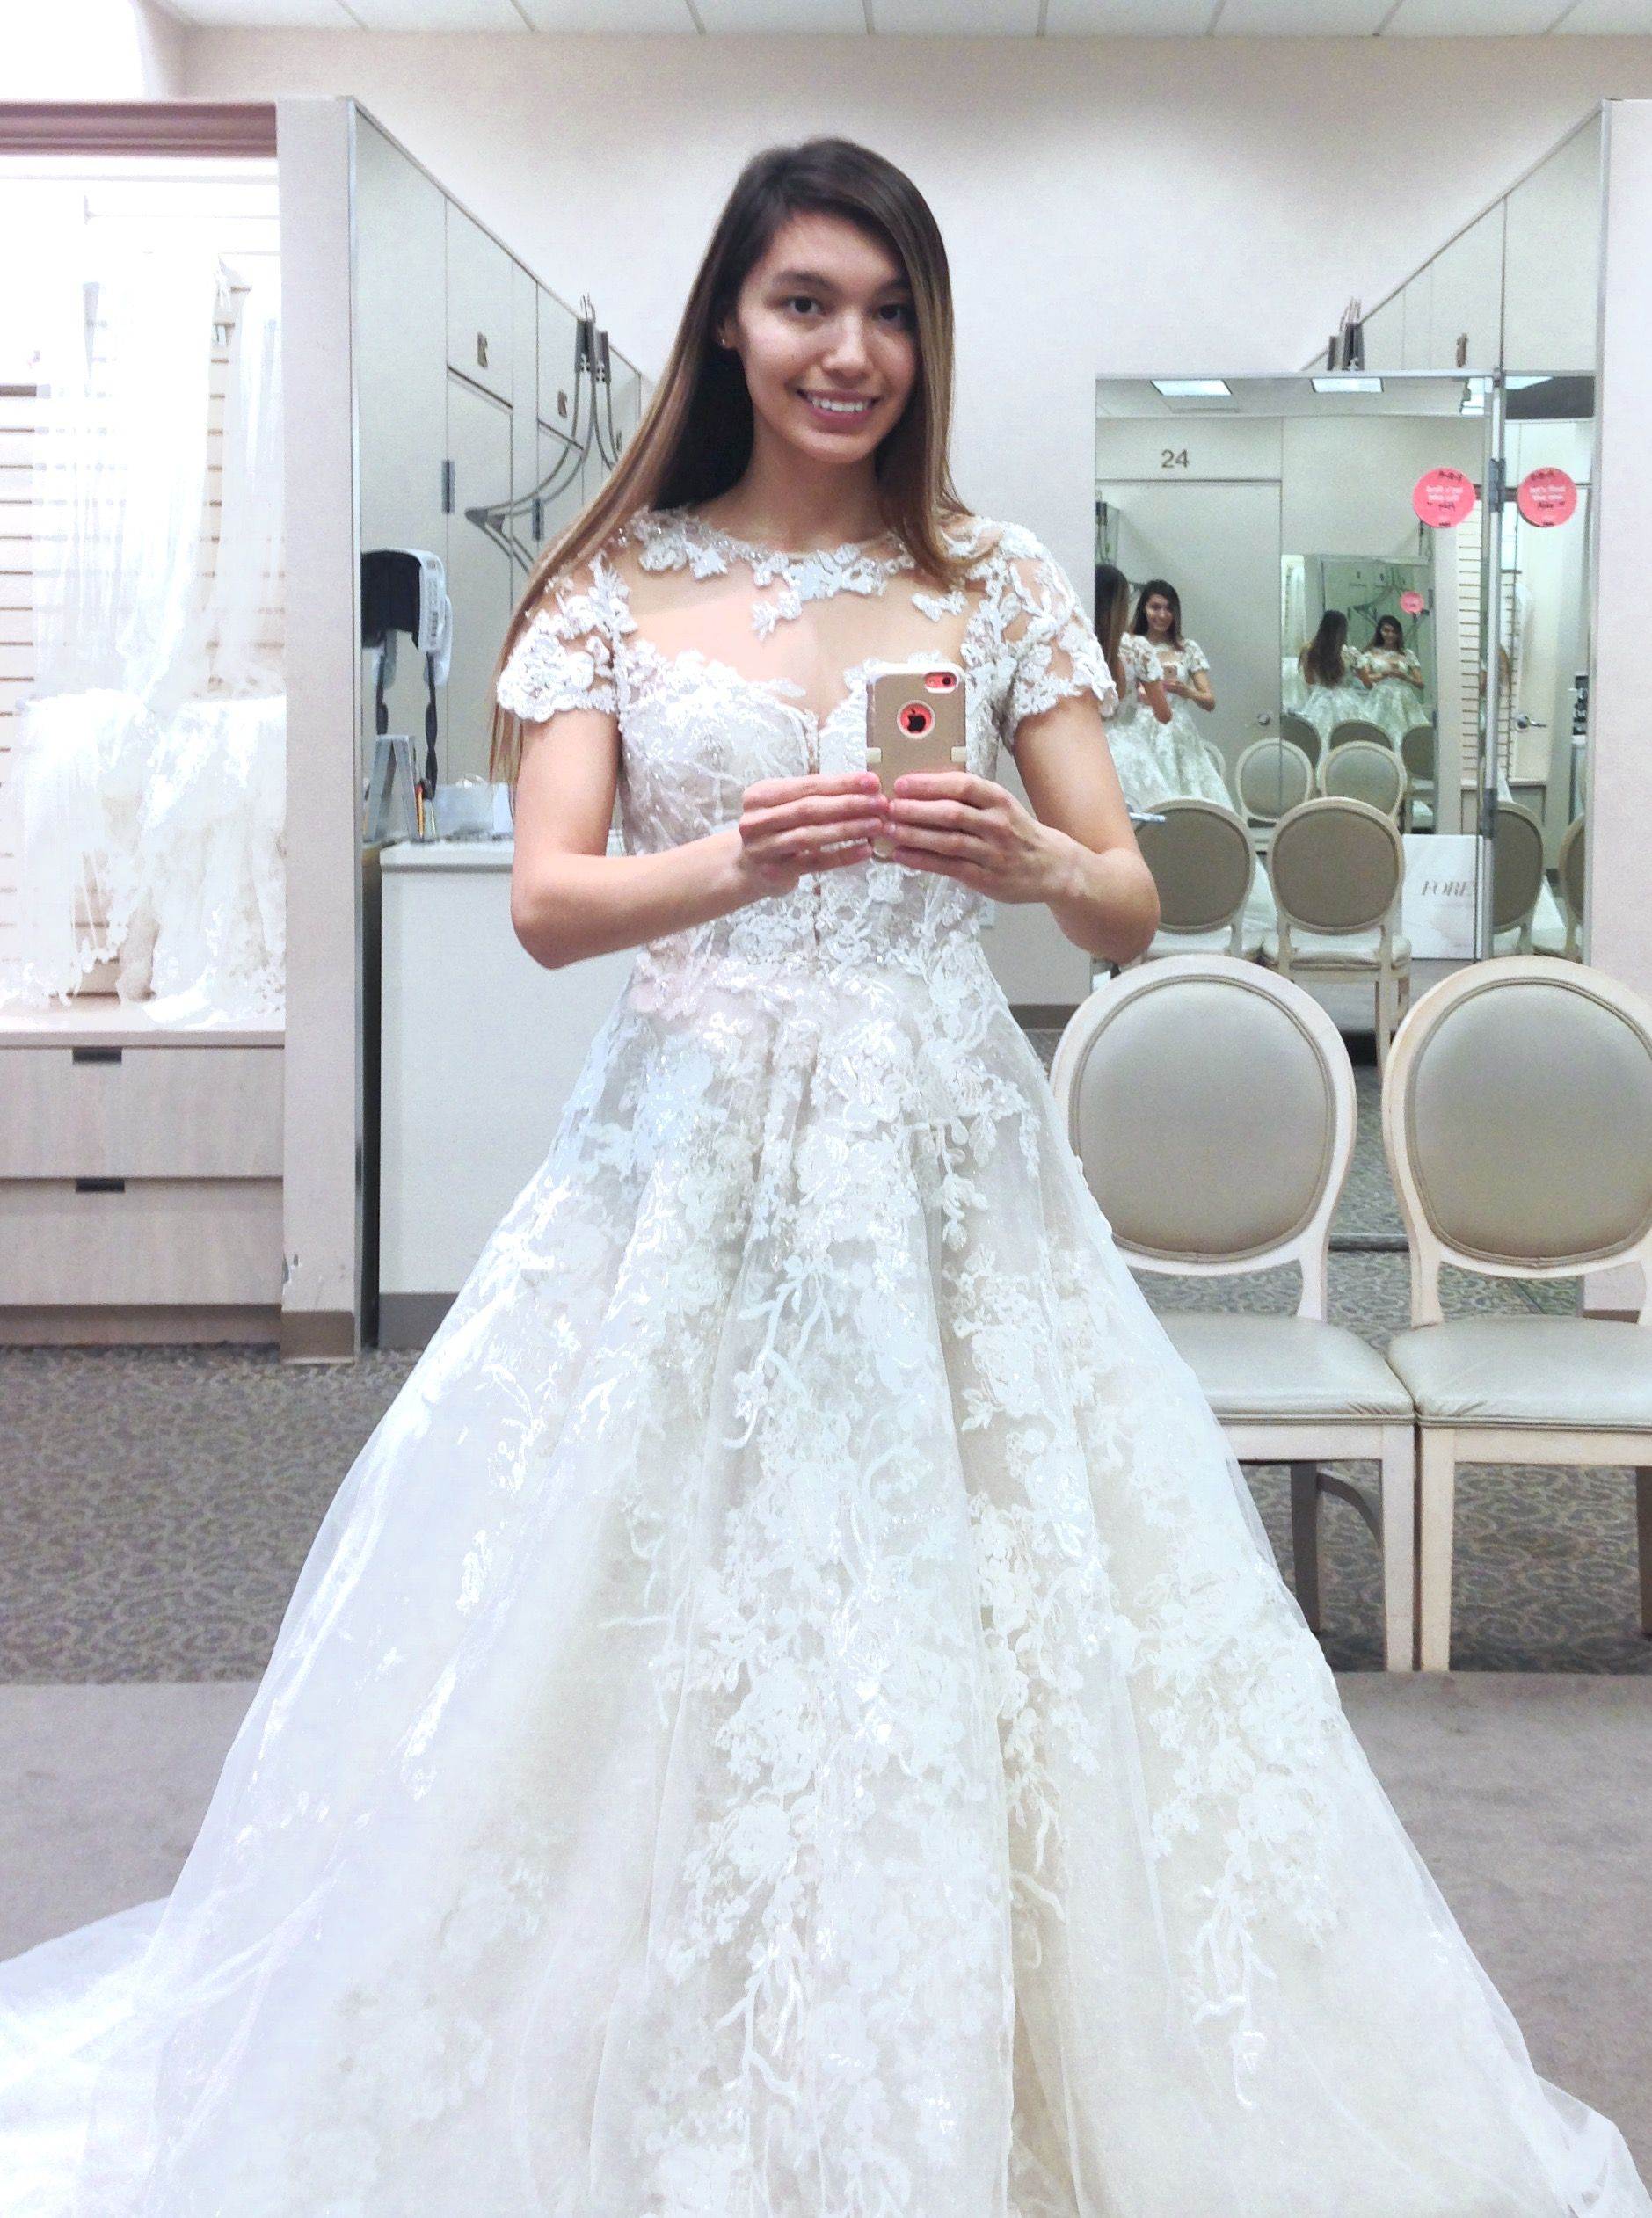 Style Cwg833 By Oleg Cassini 1 658 Lace Weddings Dresses